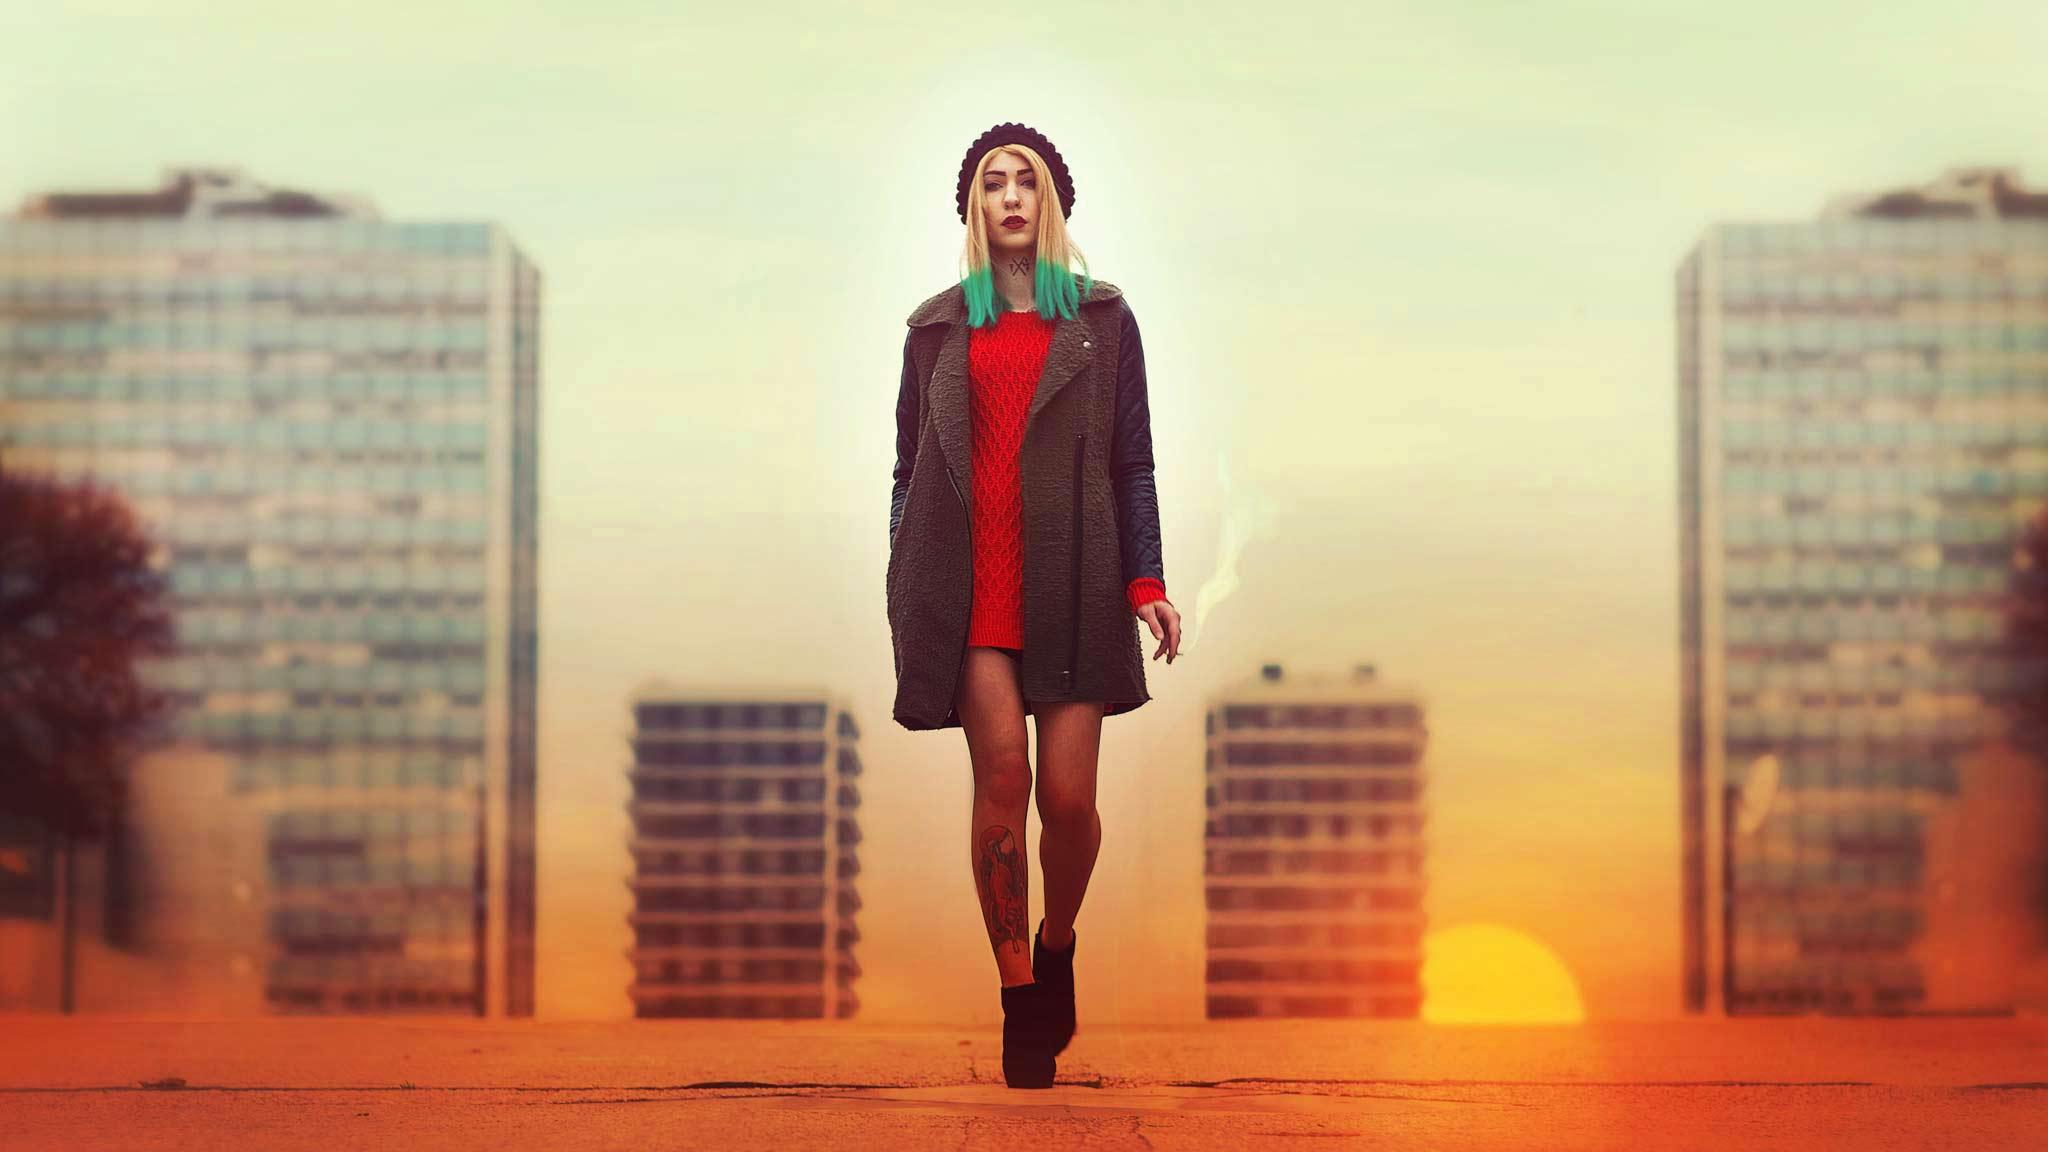 portrait alternative model cityscape dusk sunset tatooed SG Suicide Girl sexy movie french photographer art